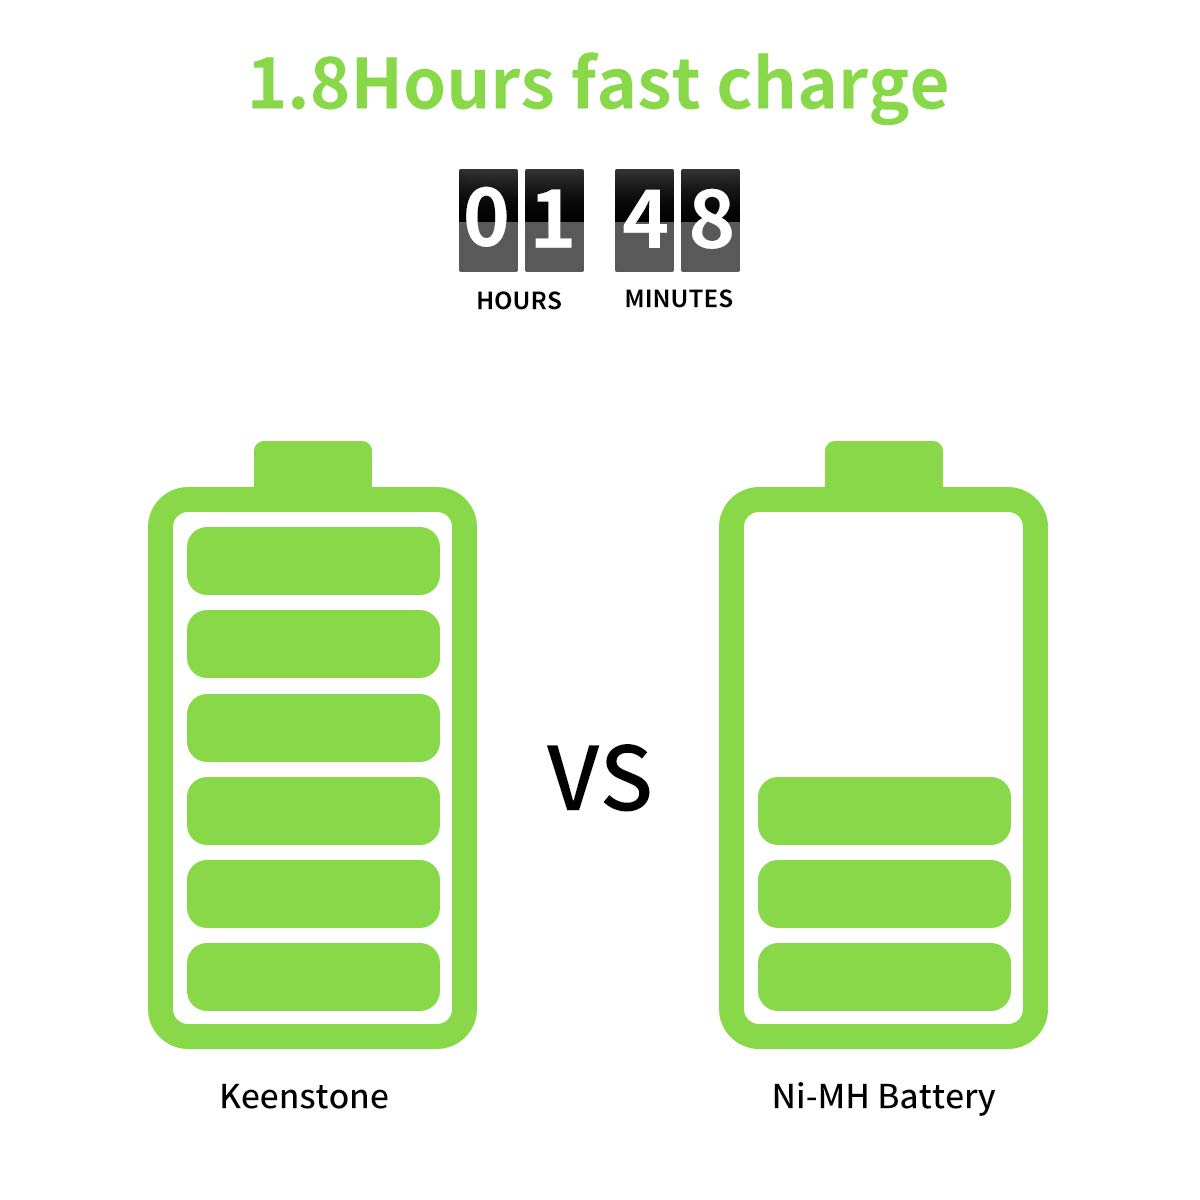 Keenstone AA 4PCS Pilas Li-ion Recargables Batería 1.5V 1000 Ciclos con Cargador de 2 Ranuras, para Blink Cámara, Linterna, Juguetes, Control Remoto